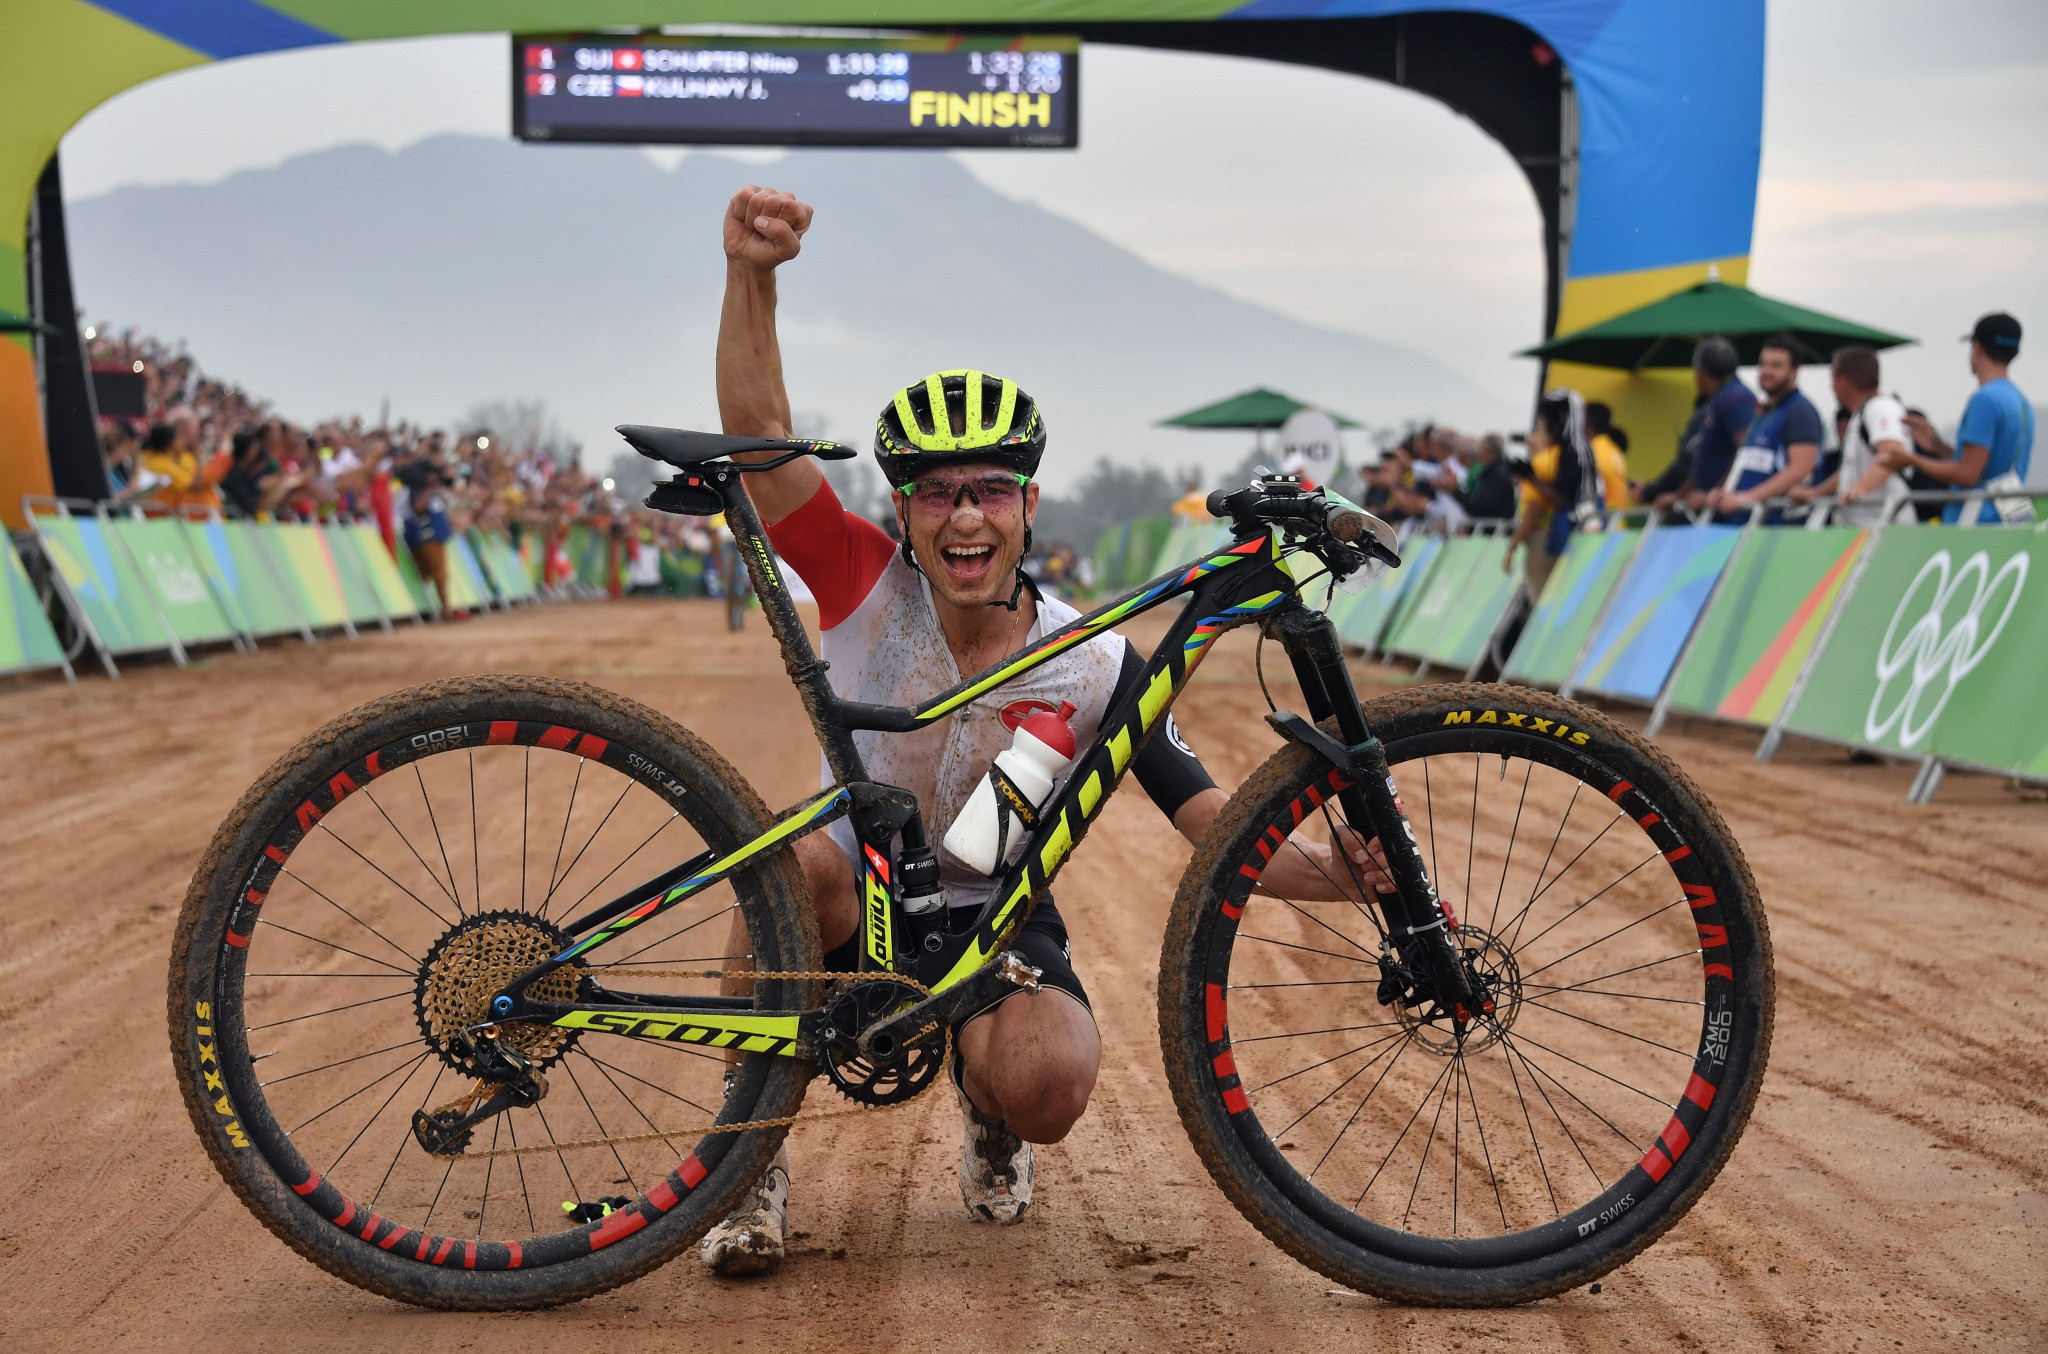 Schurter seeking to cap perfect season with UCI Mountain ...